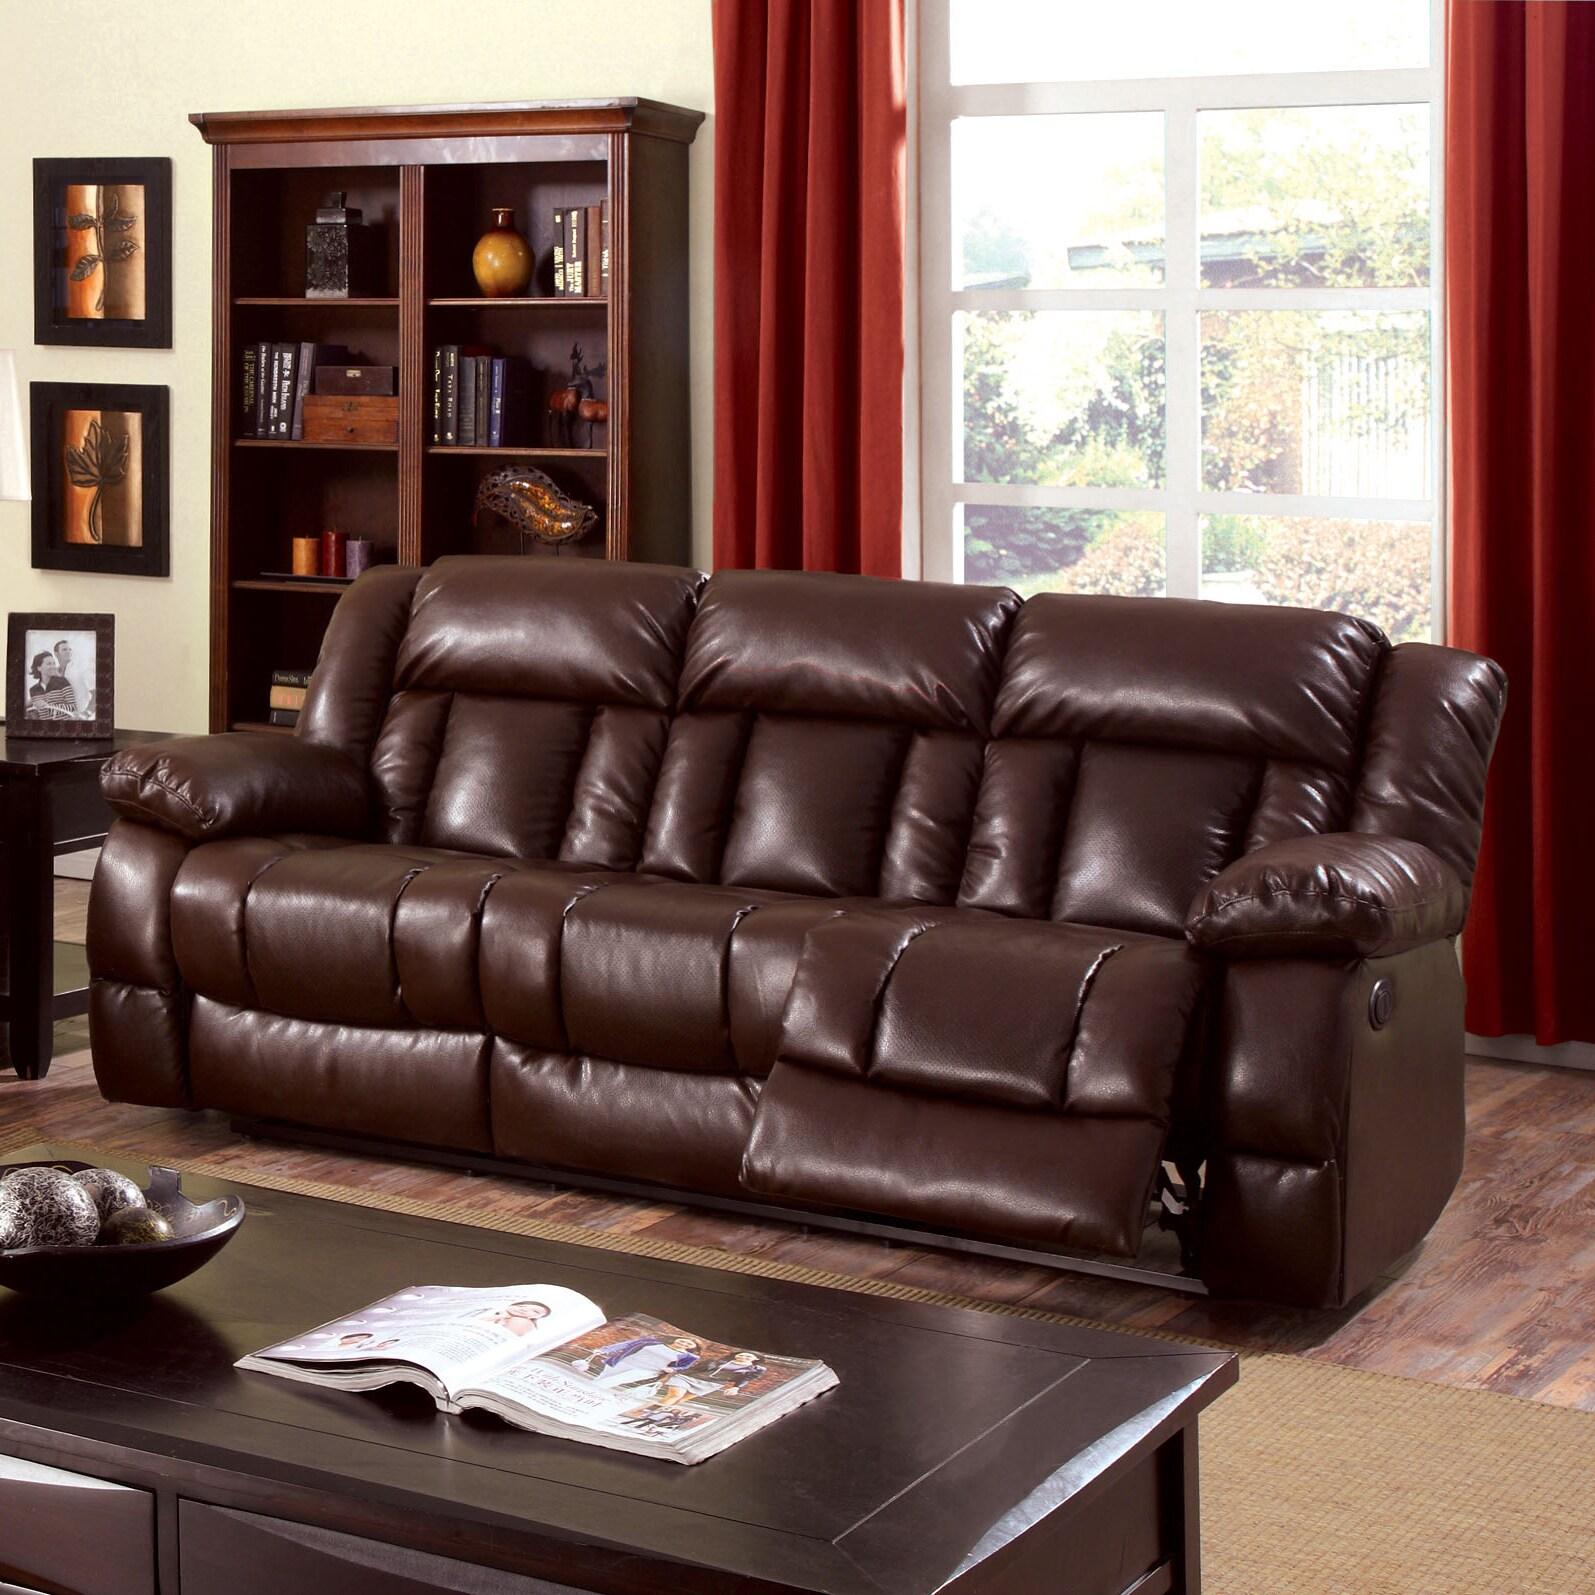 Furniture of America Brentan Dark Brown Bonded Leather Re...